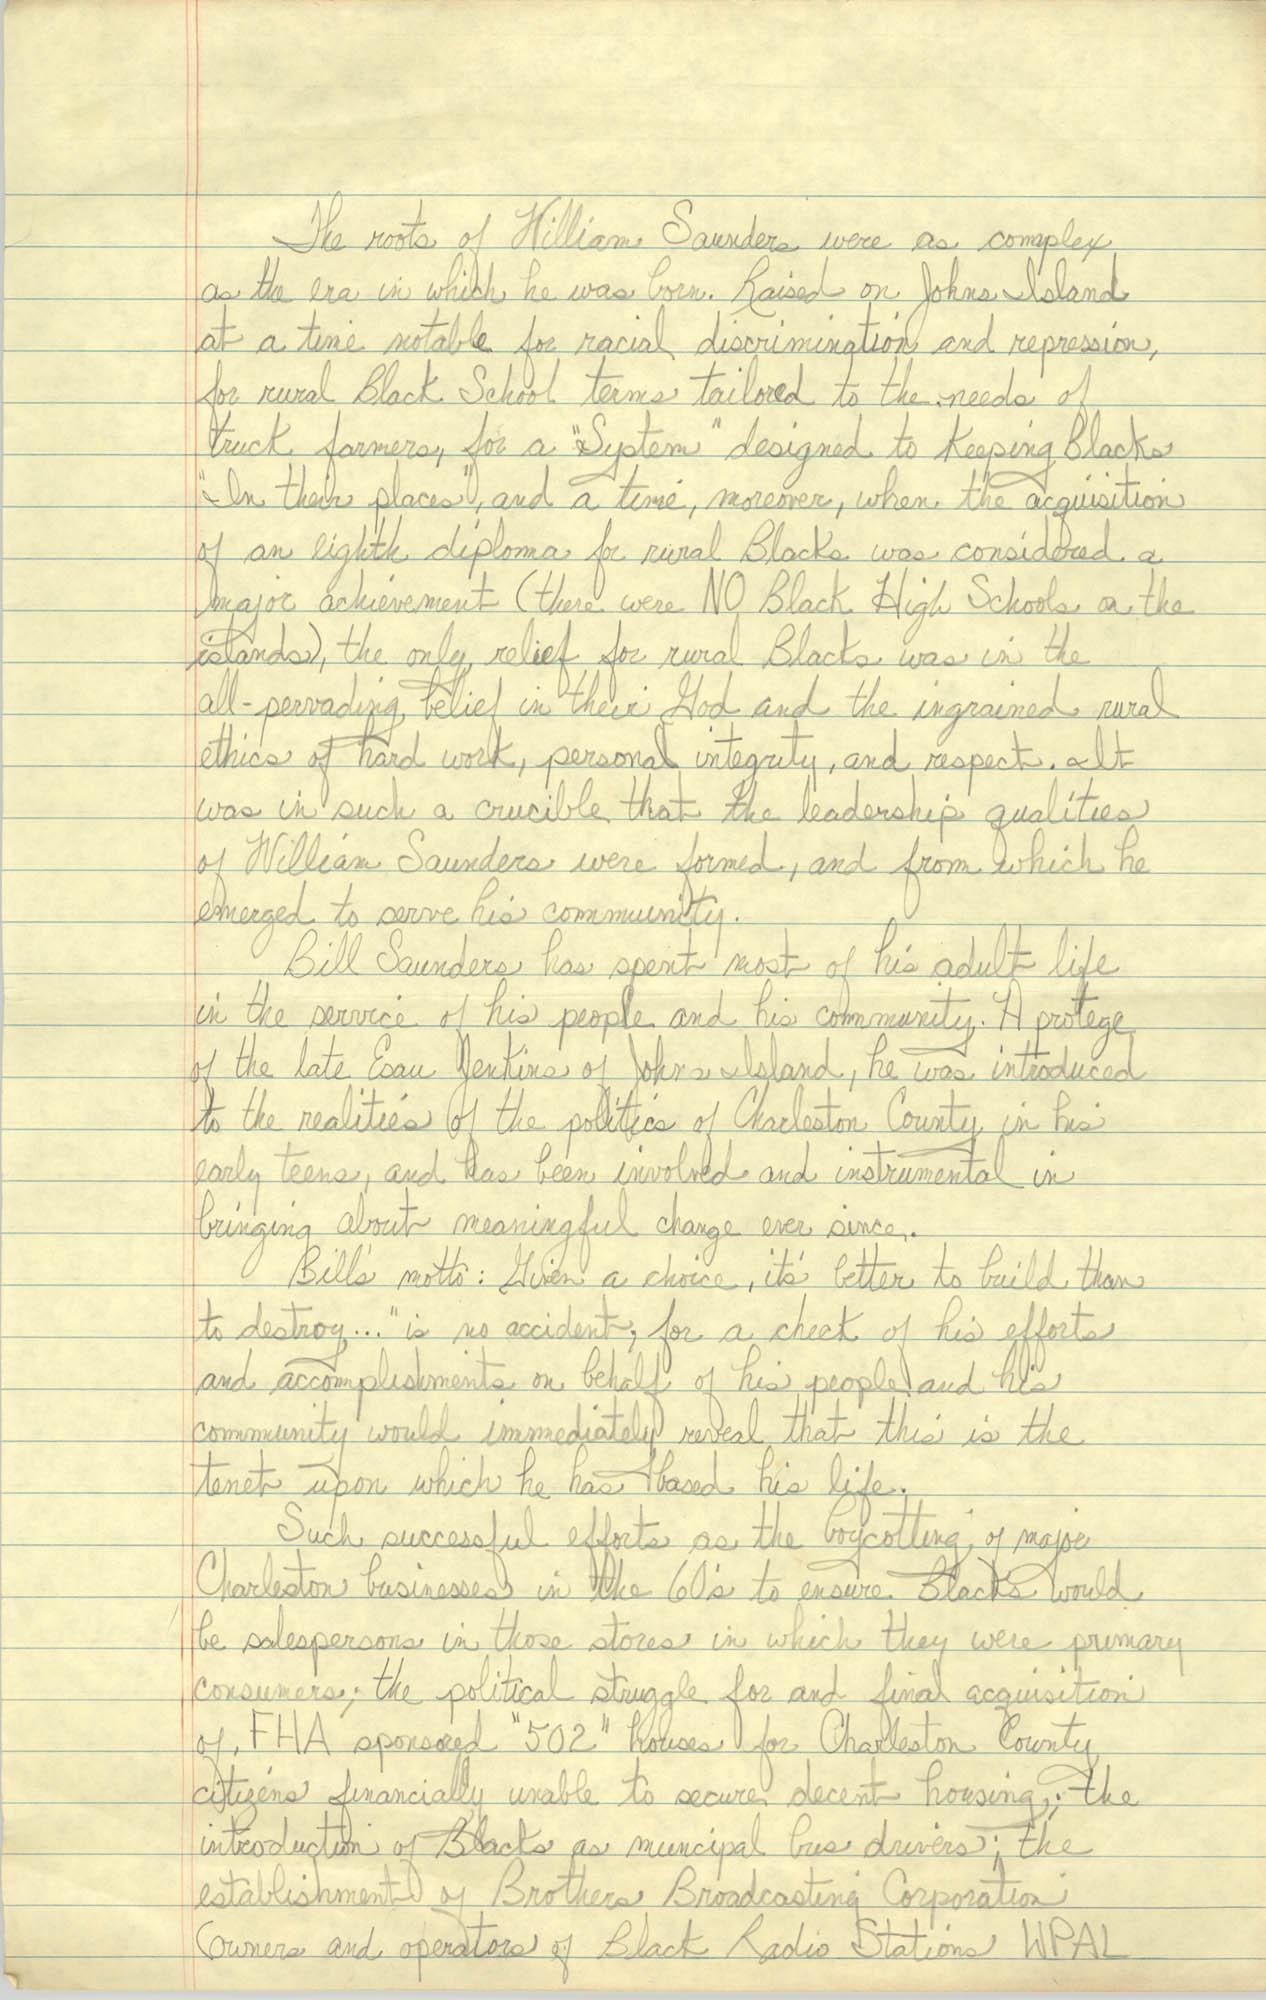 Biography of William Saunders